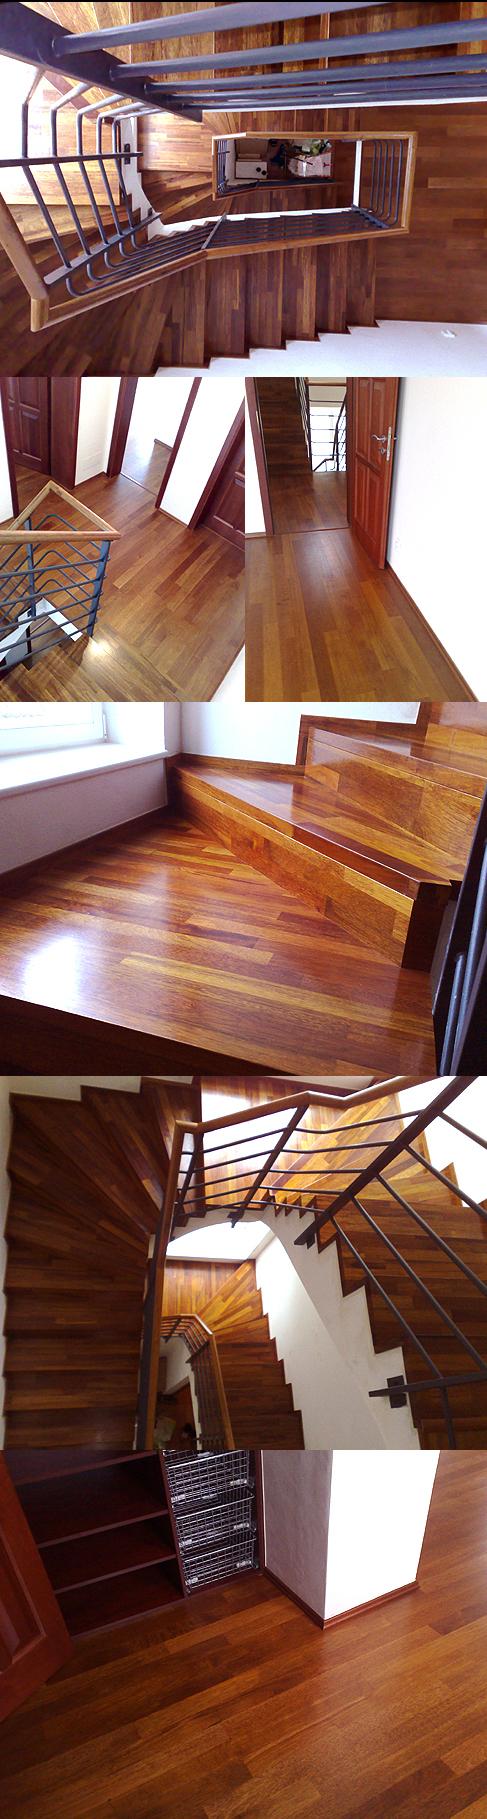 Vila Dejvice - 320 m2